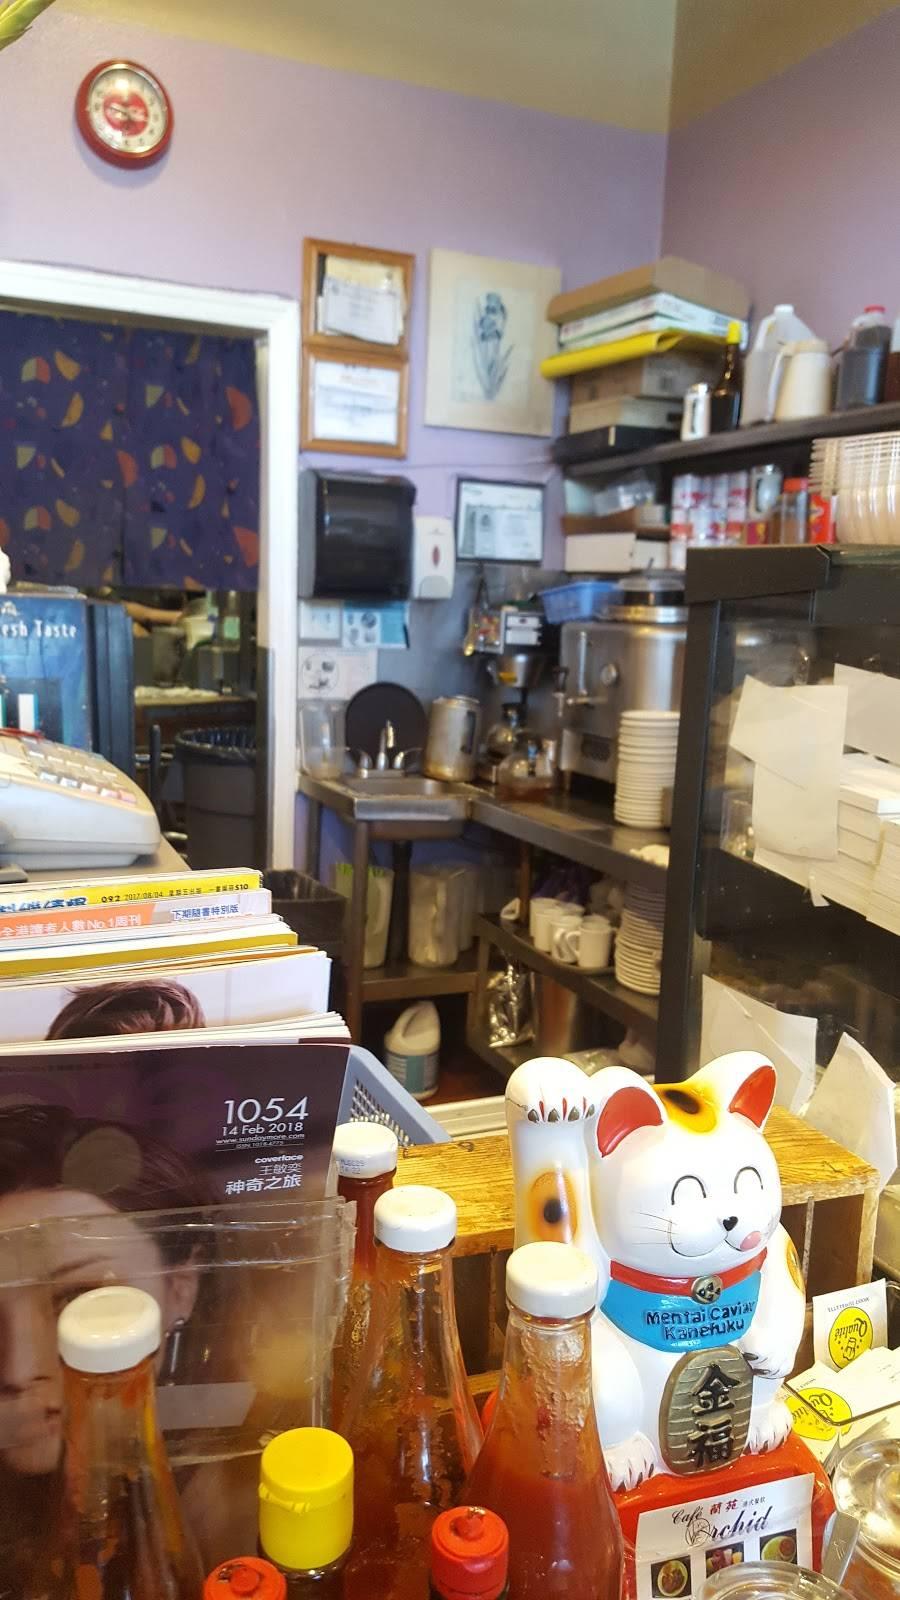 Cafe Orchid | restaurant | 9 El Camino Real, Millbrae, CA 94030, USA | 6506973988 OR +1 650-697-3988